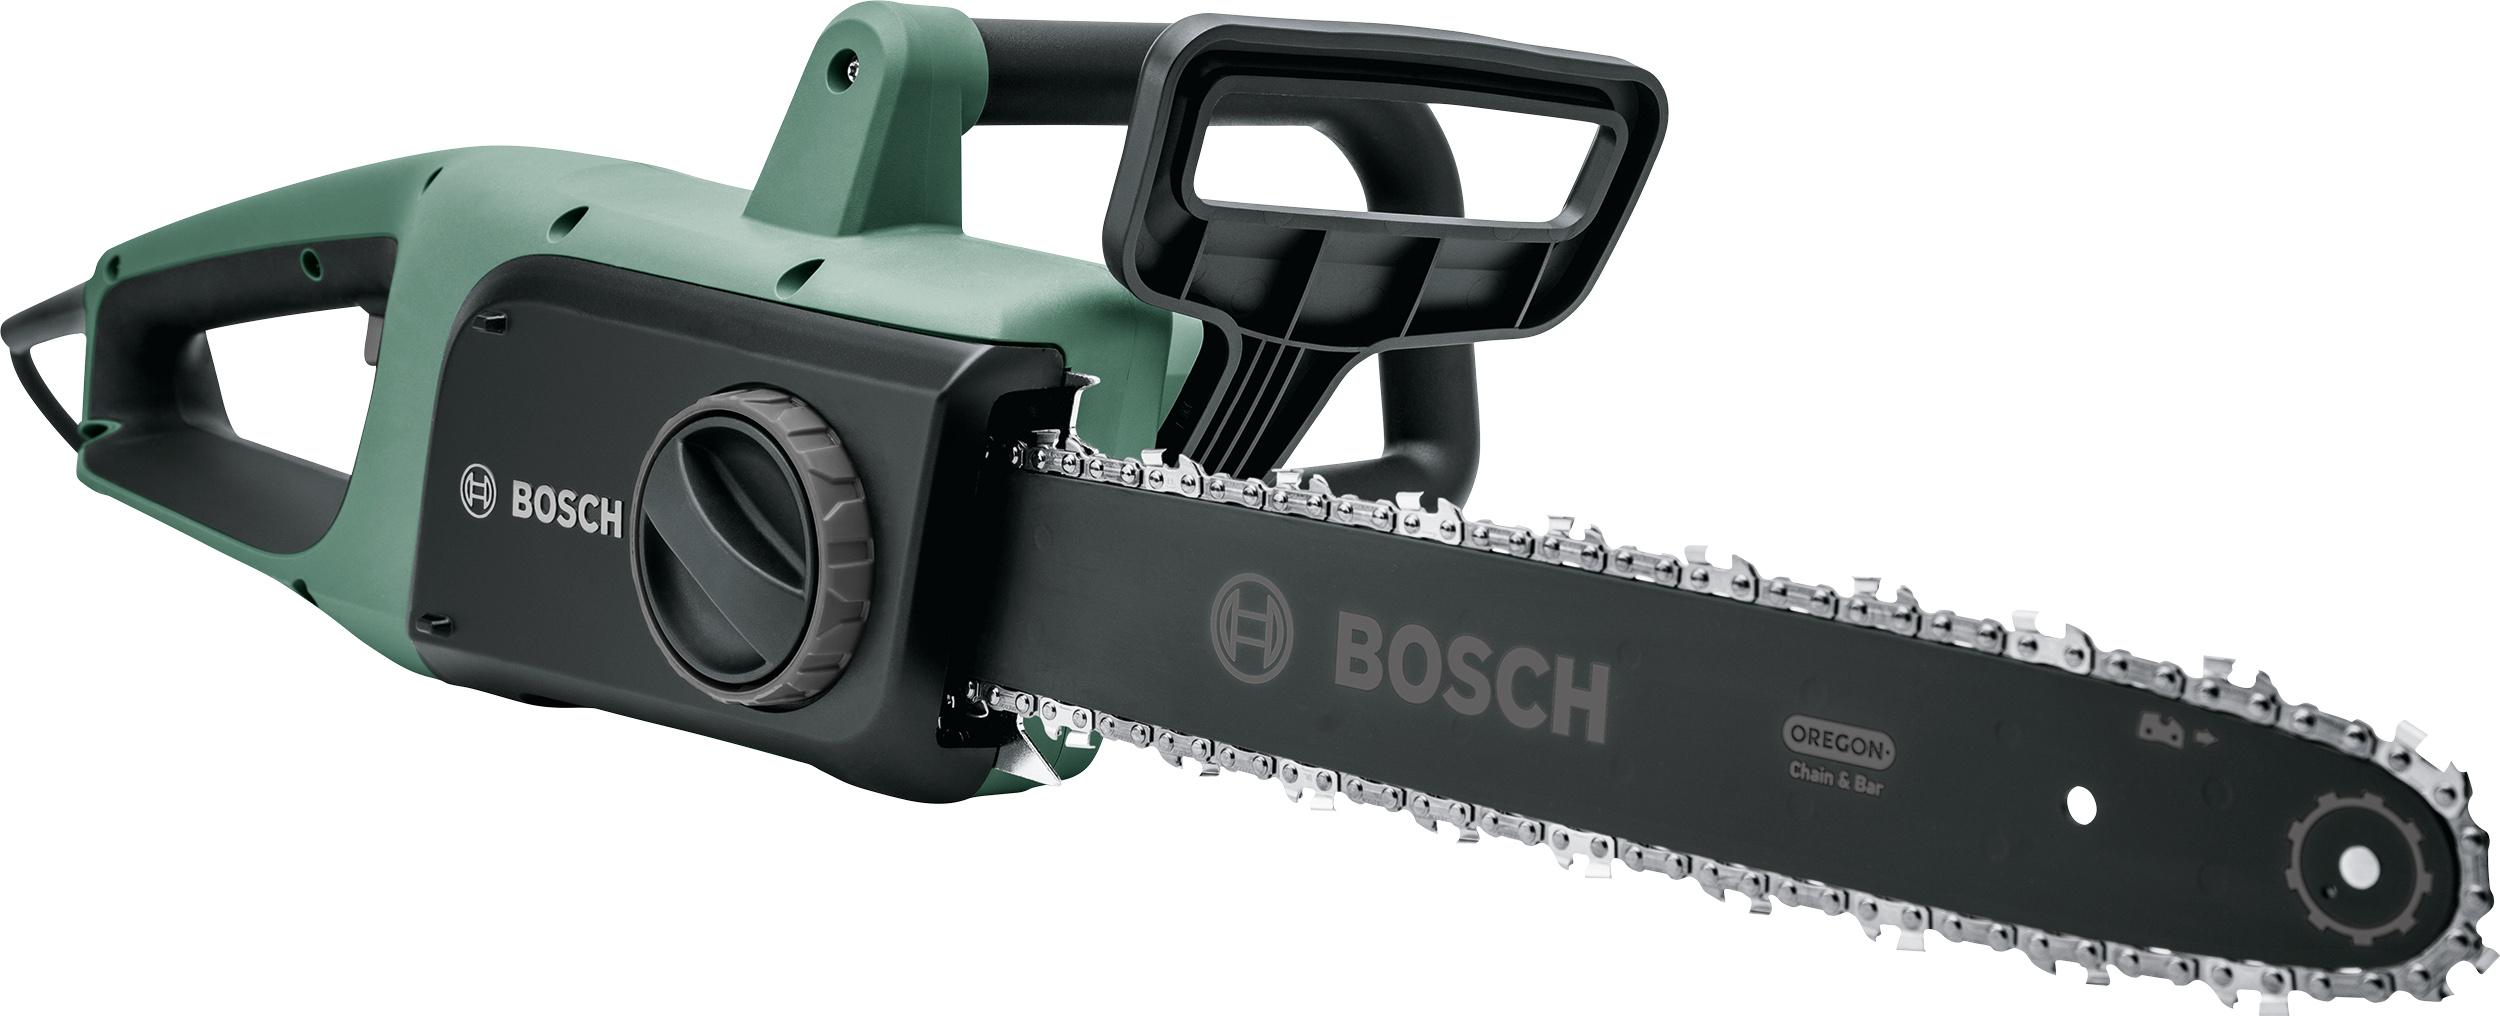 Пила цепная электрическая BOSCH Universal Chain 35